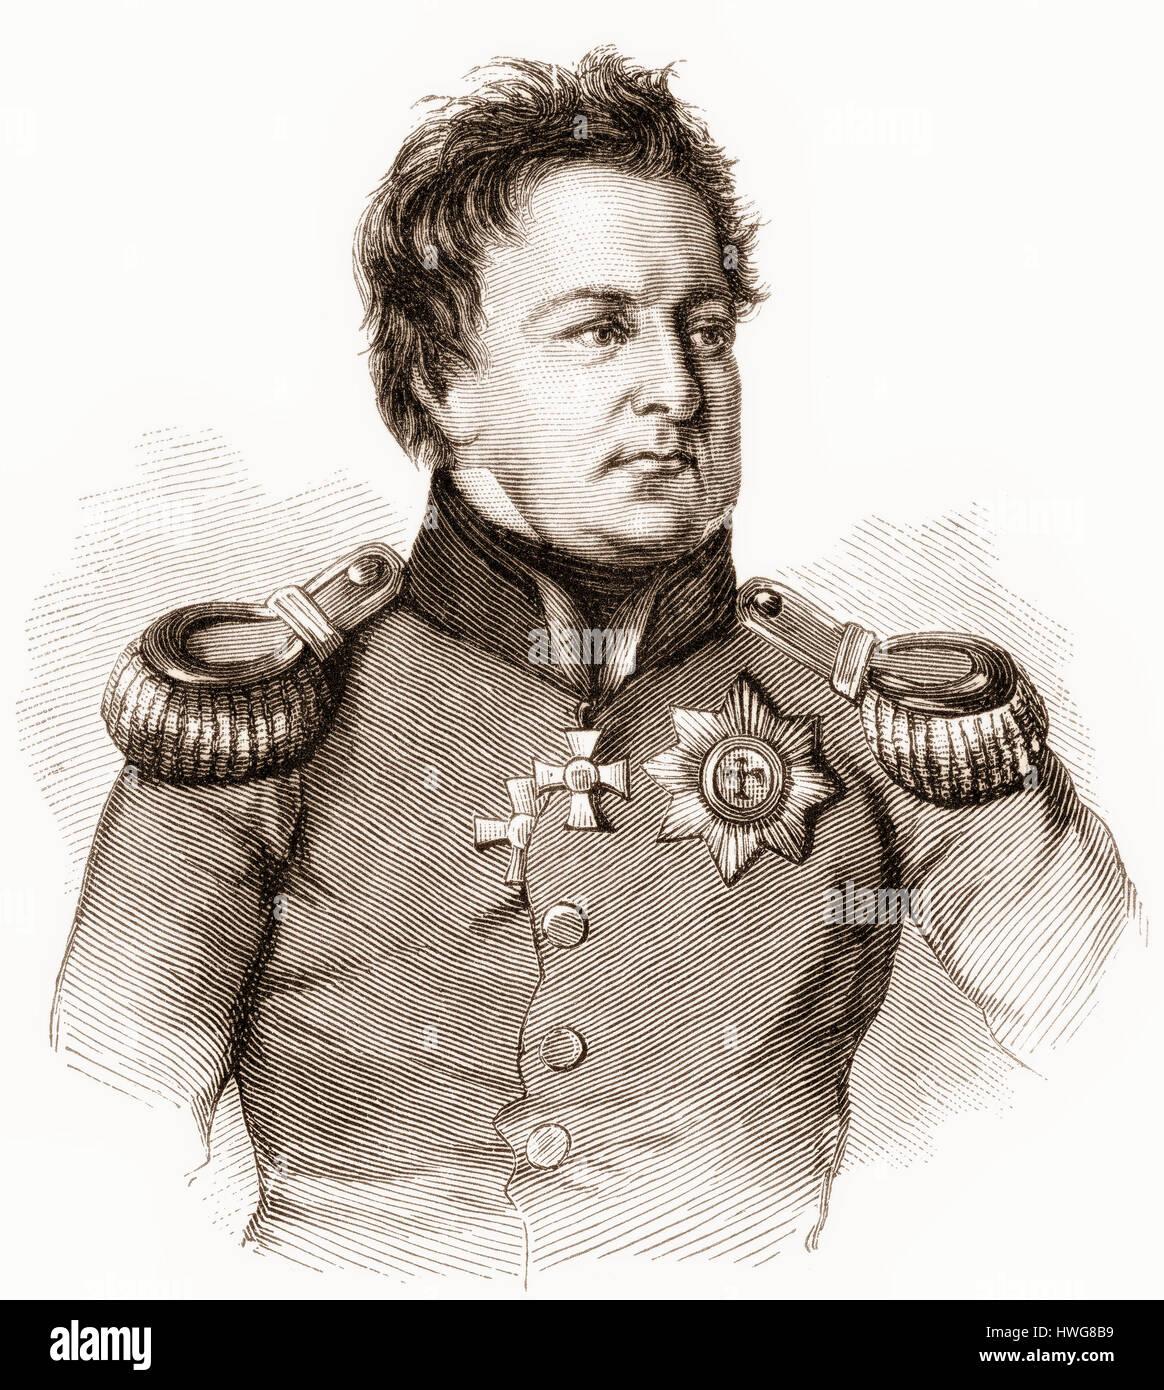 August Wilhelm Antonius Graf Neidhardt von Gneisenau, 1760 - 1831, a Prussian Field Marshal - Stock Image